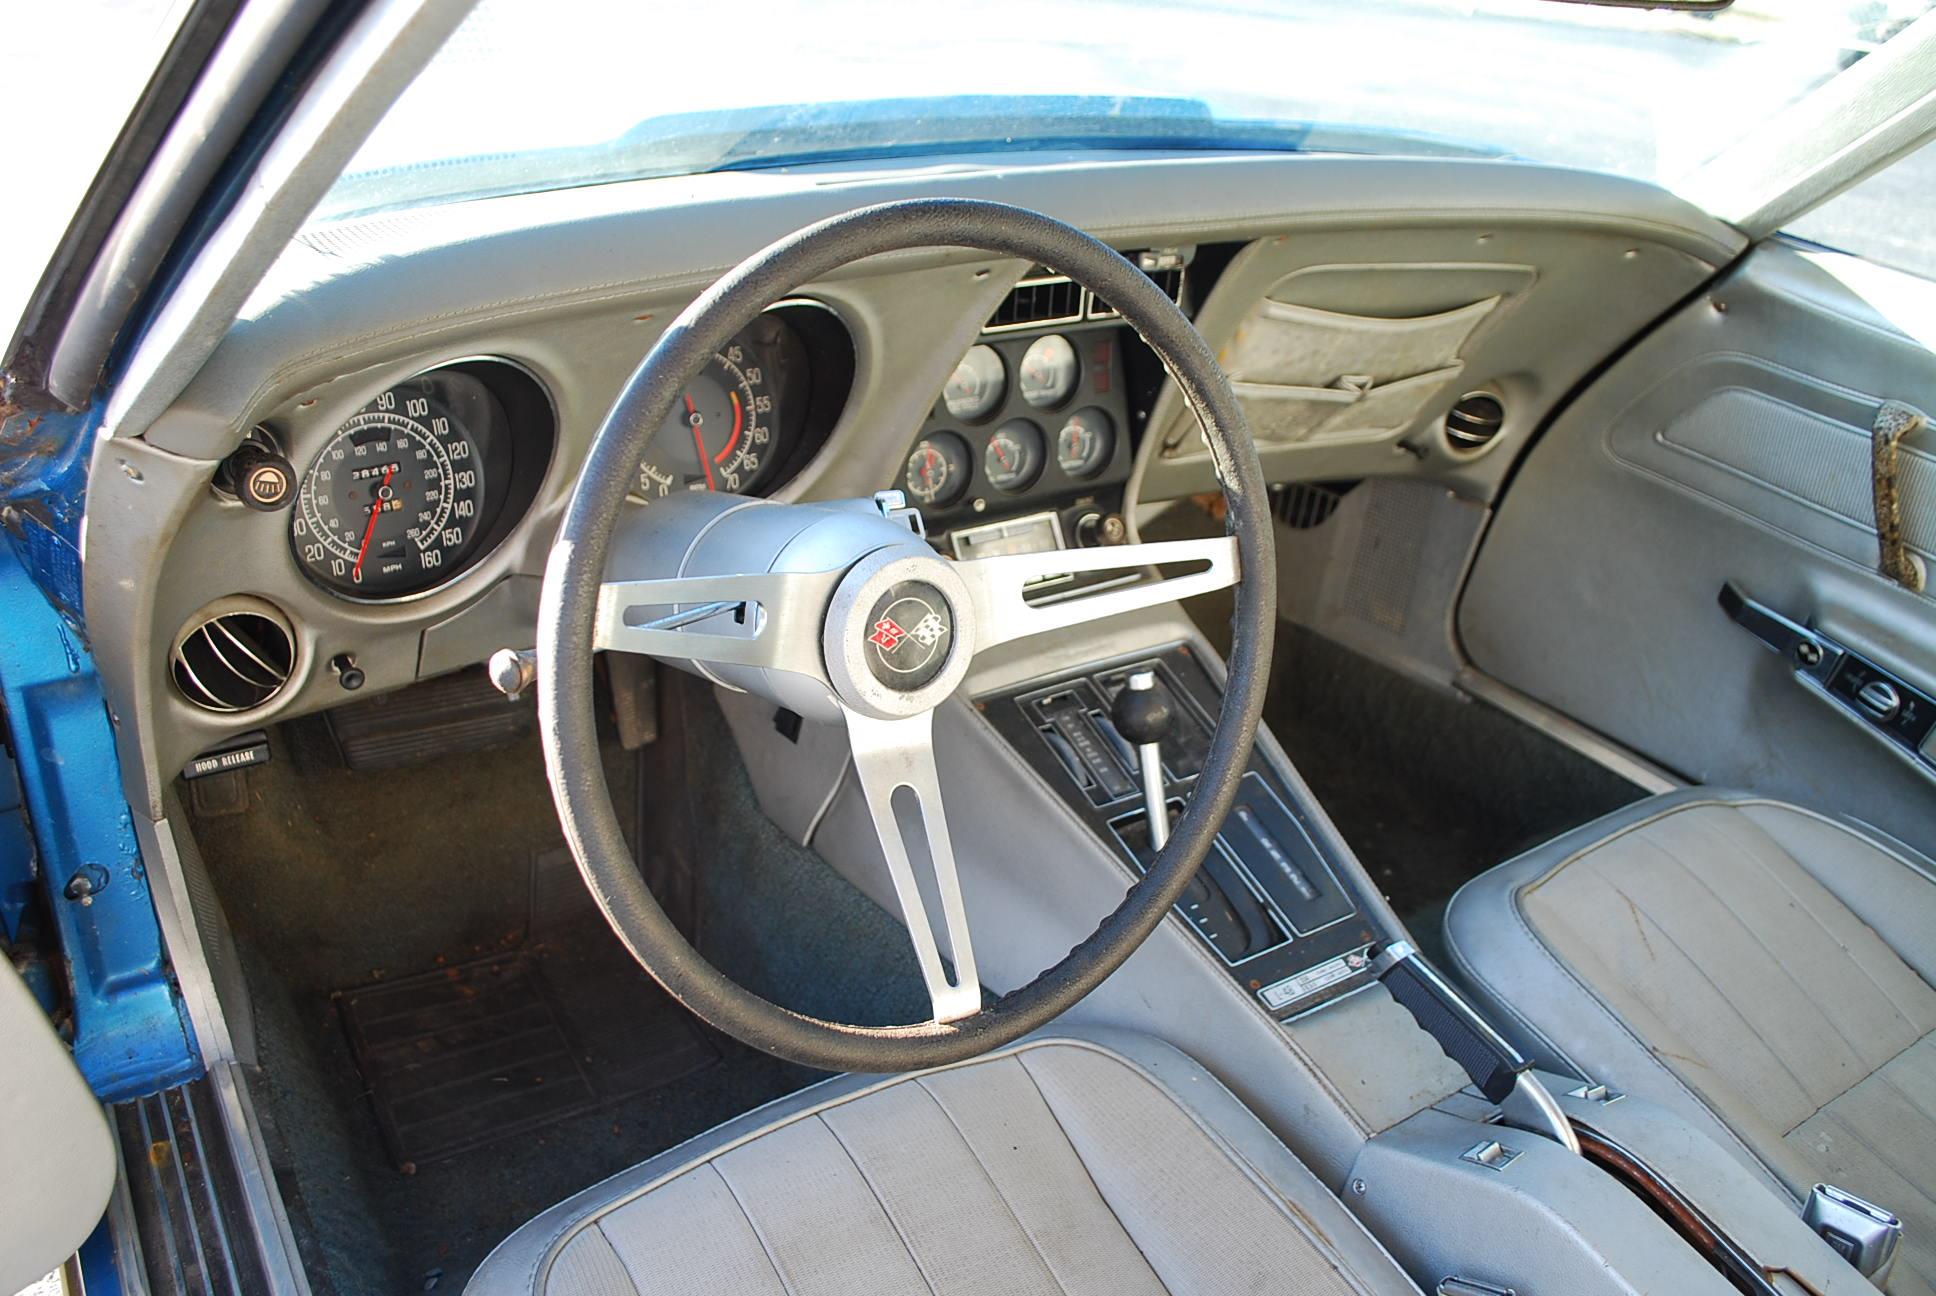 1975 Corvette Convertible - Great Project Car (SOLD)   Corvettes for